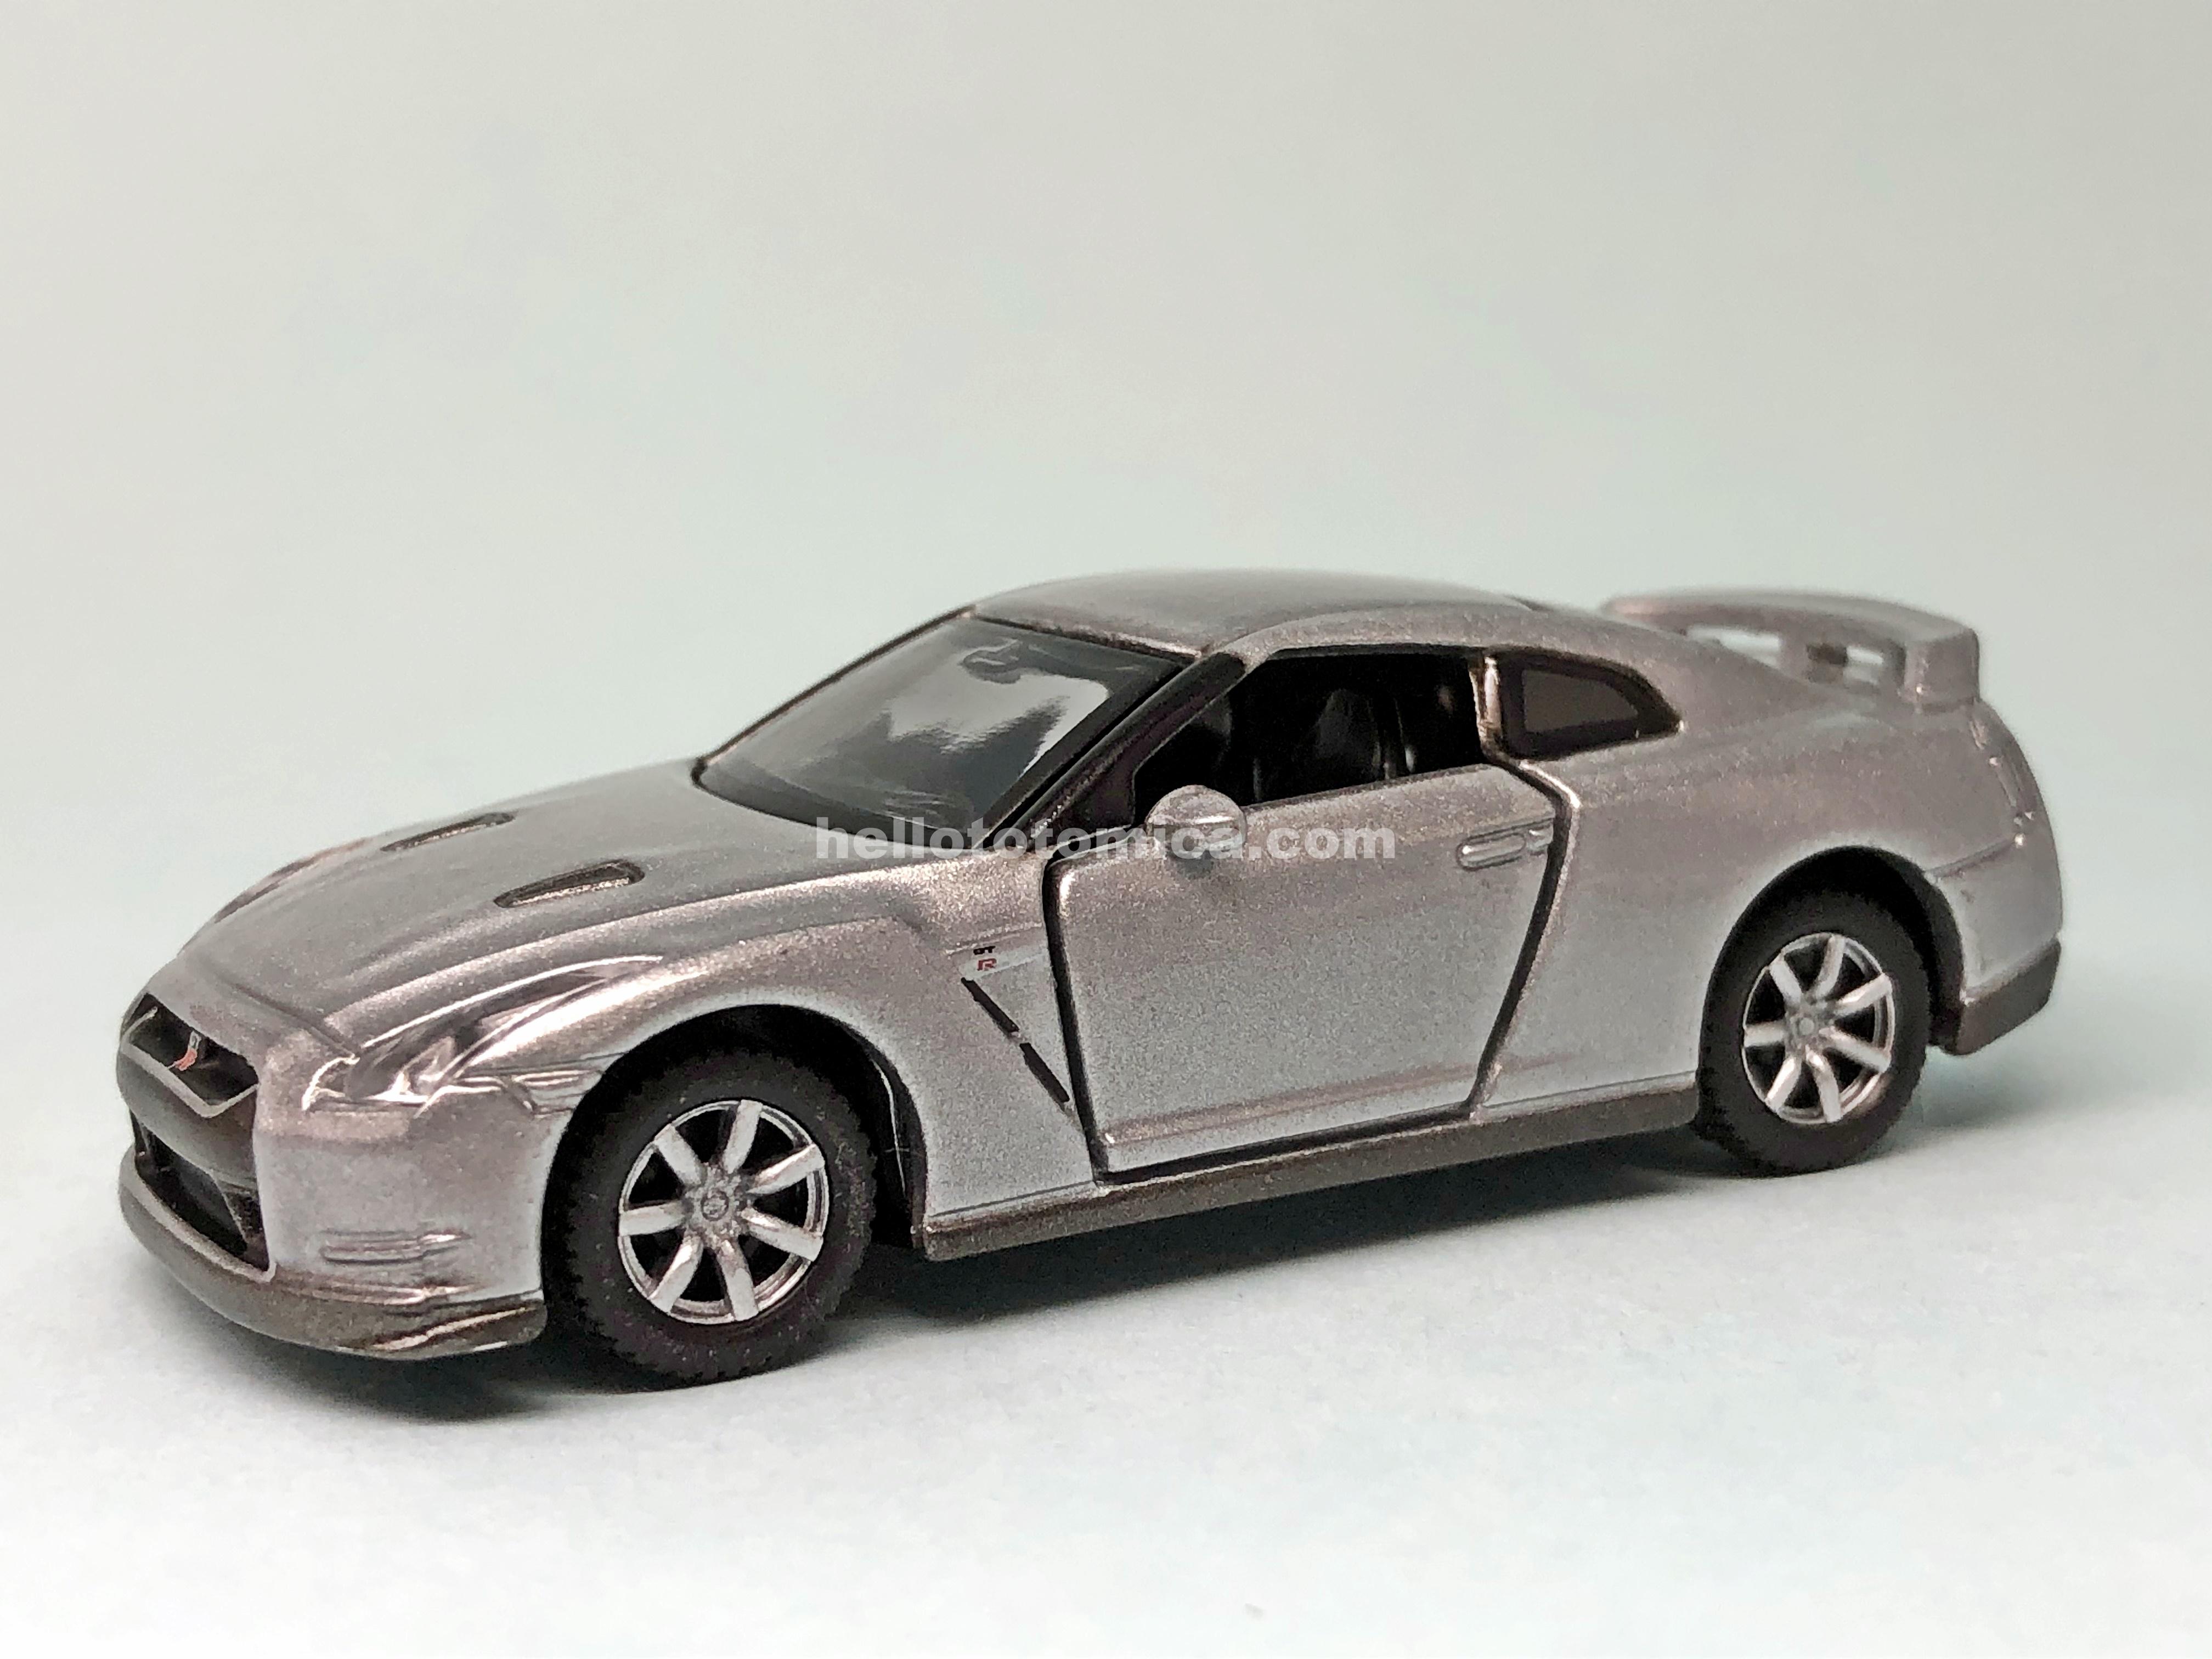 94-6 NISSAN GT-R